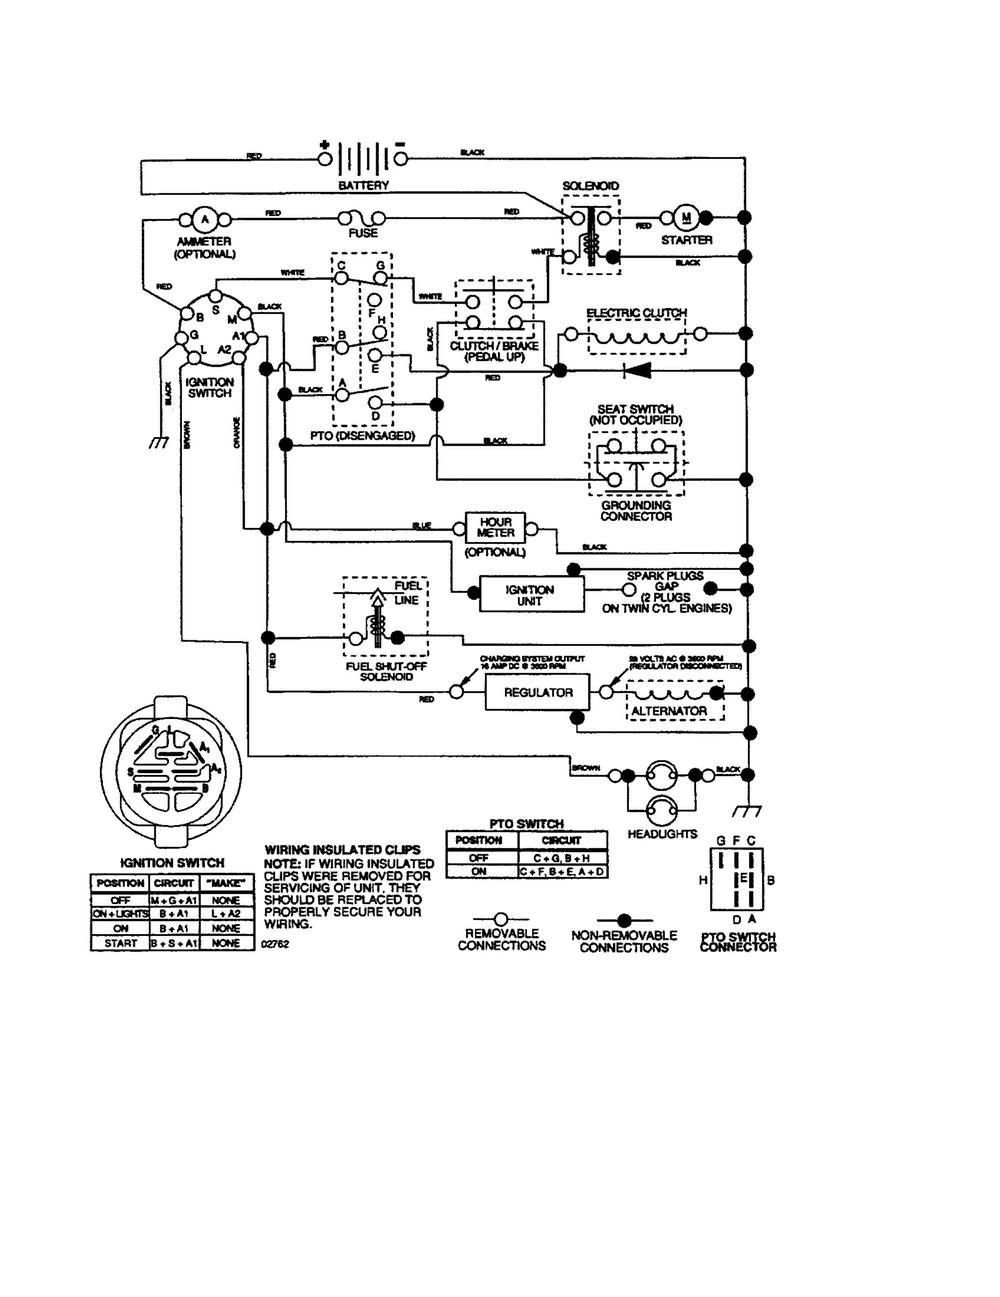 A Starter Solenoid For A Craftsman 42 U0026quot Cut 15 Hp Briggs Manual Guide